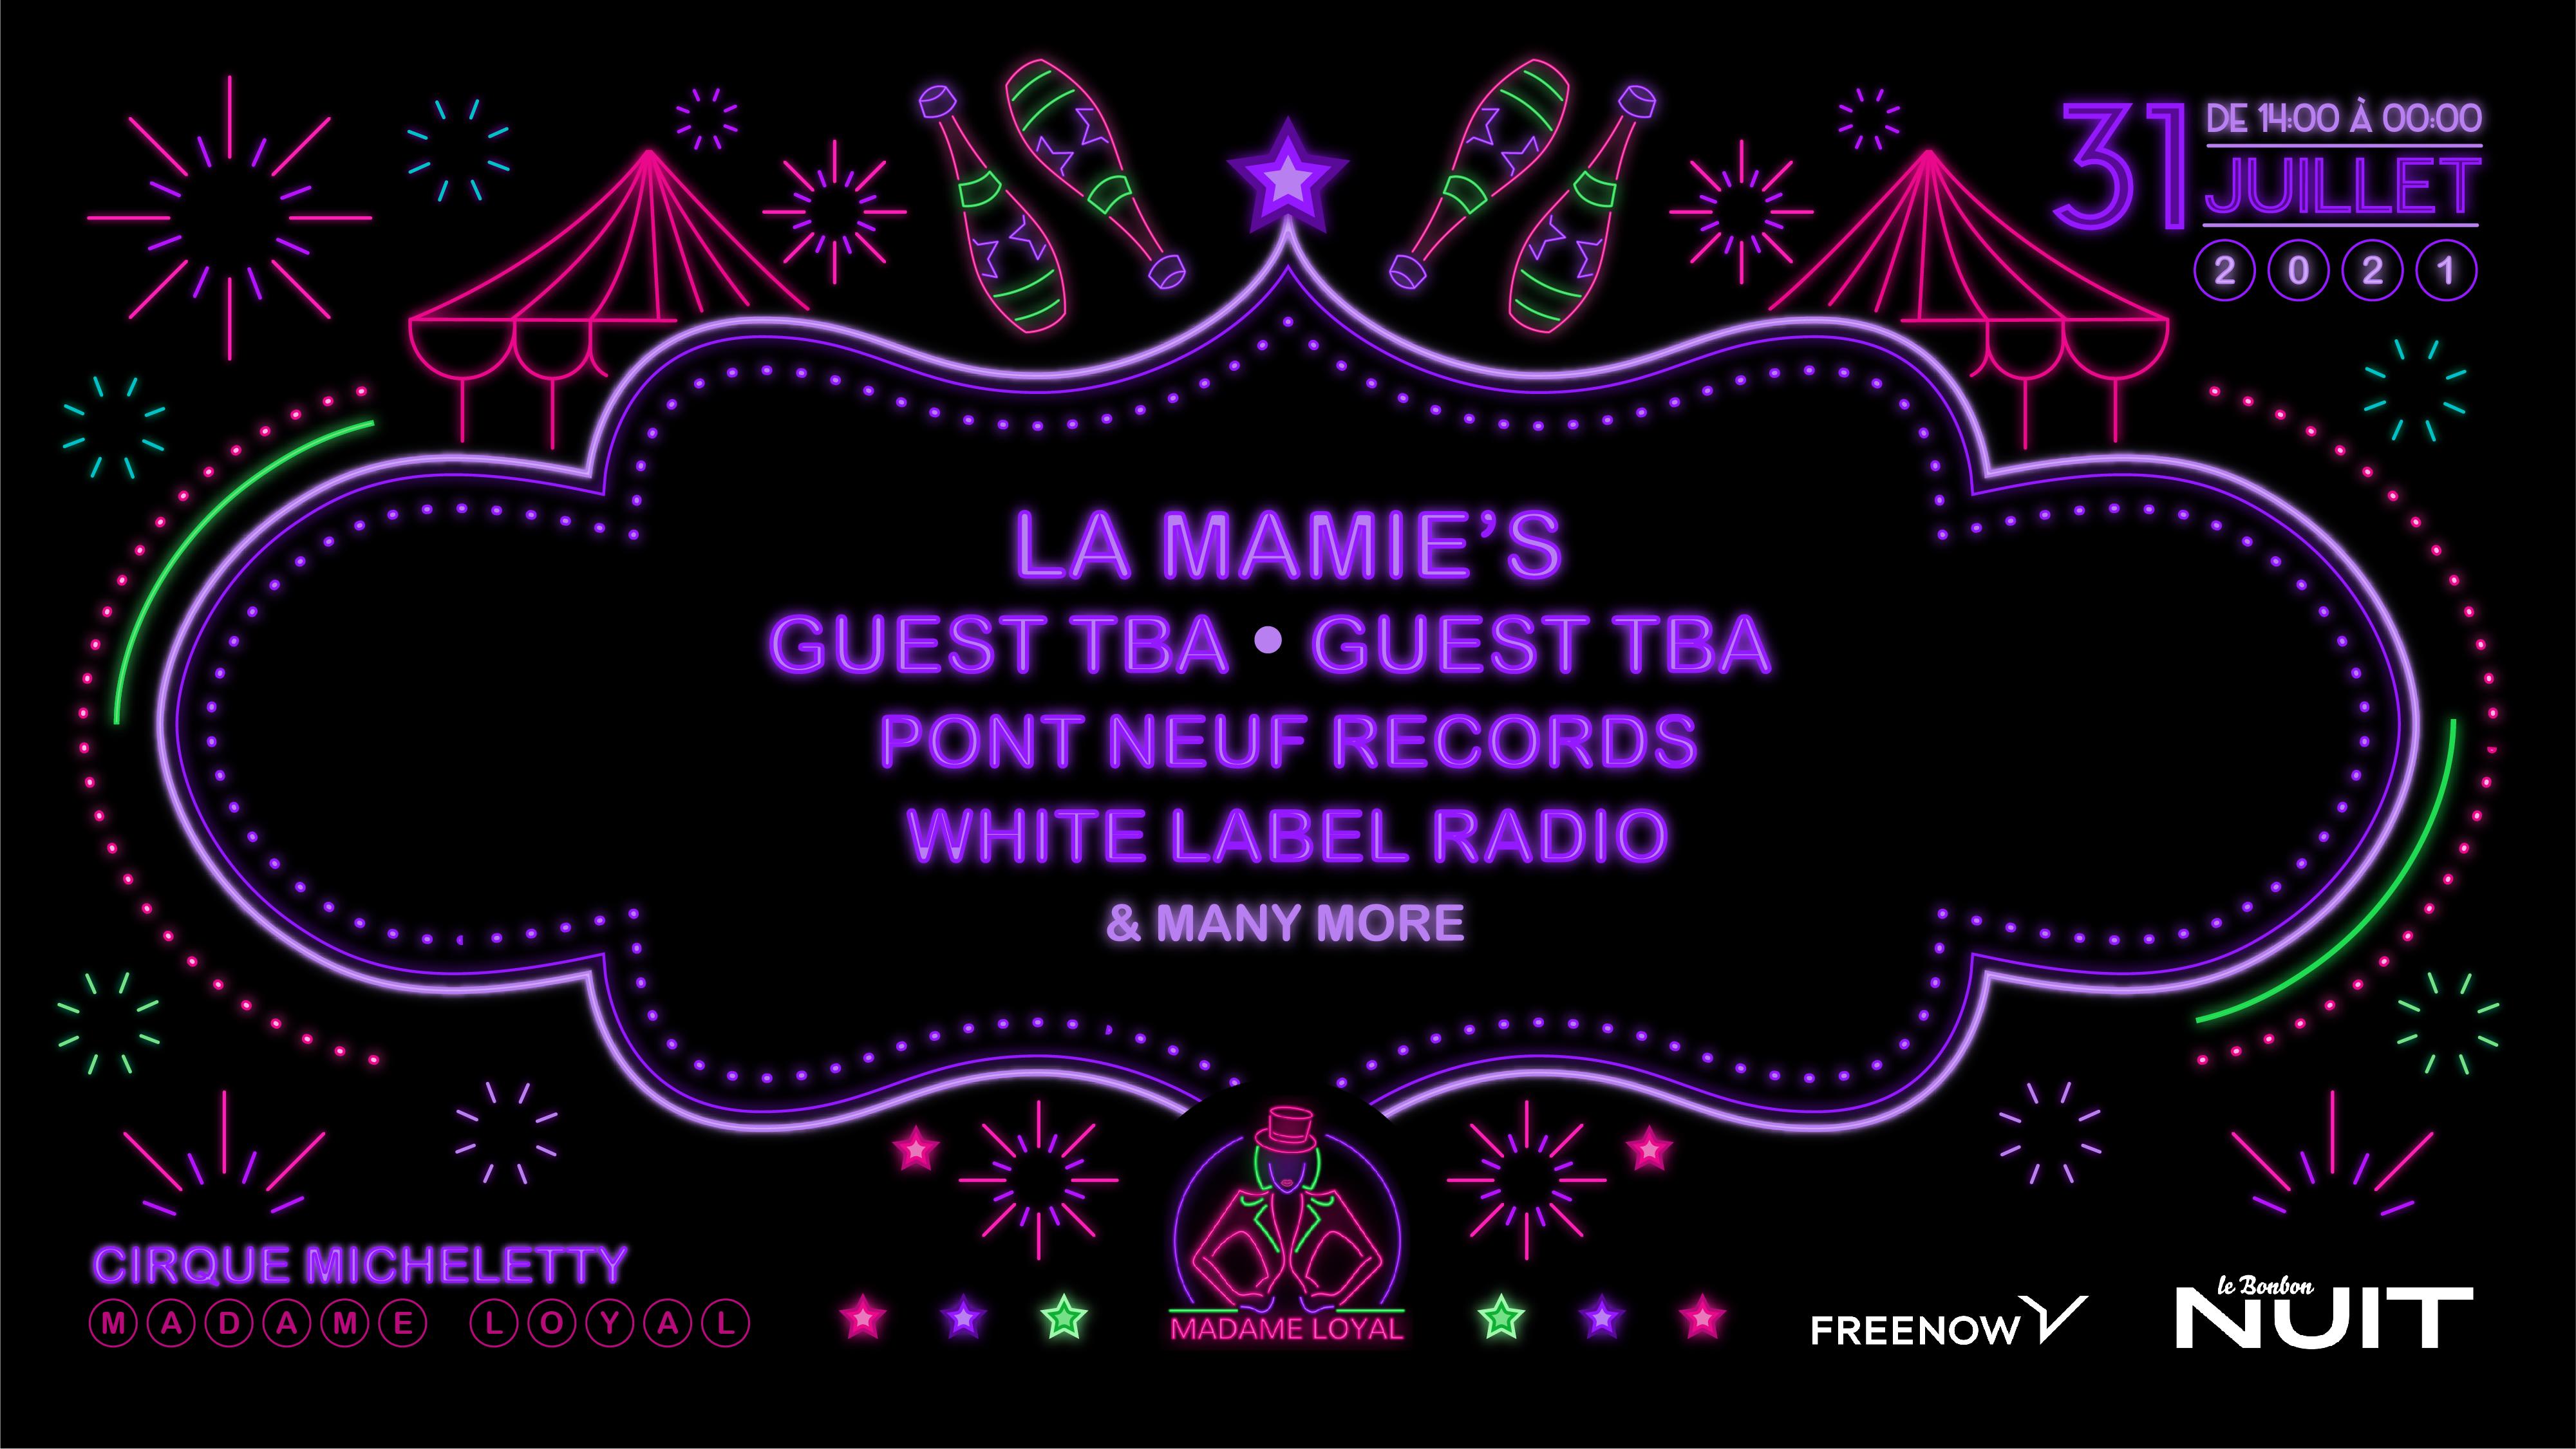 Madame Loyal : Guest TBA, La Mamies, Guest Tba, & many more